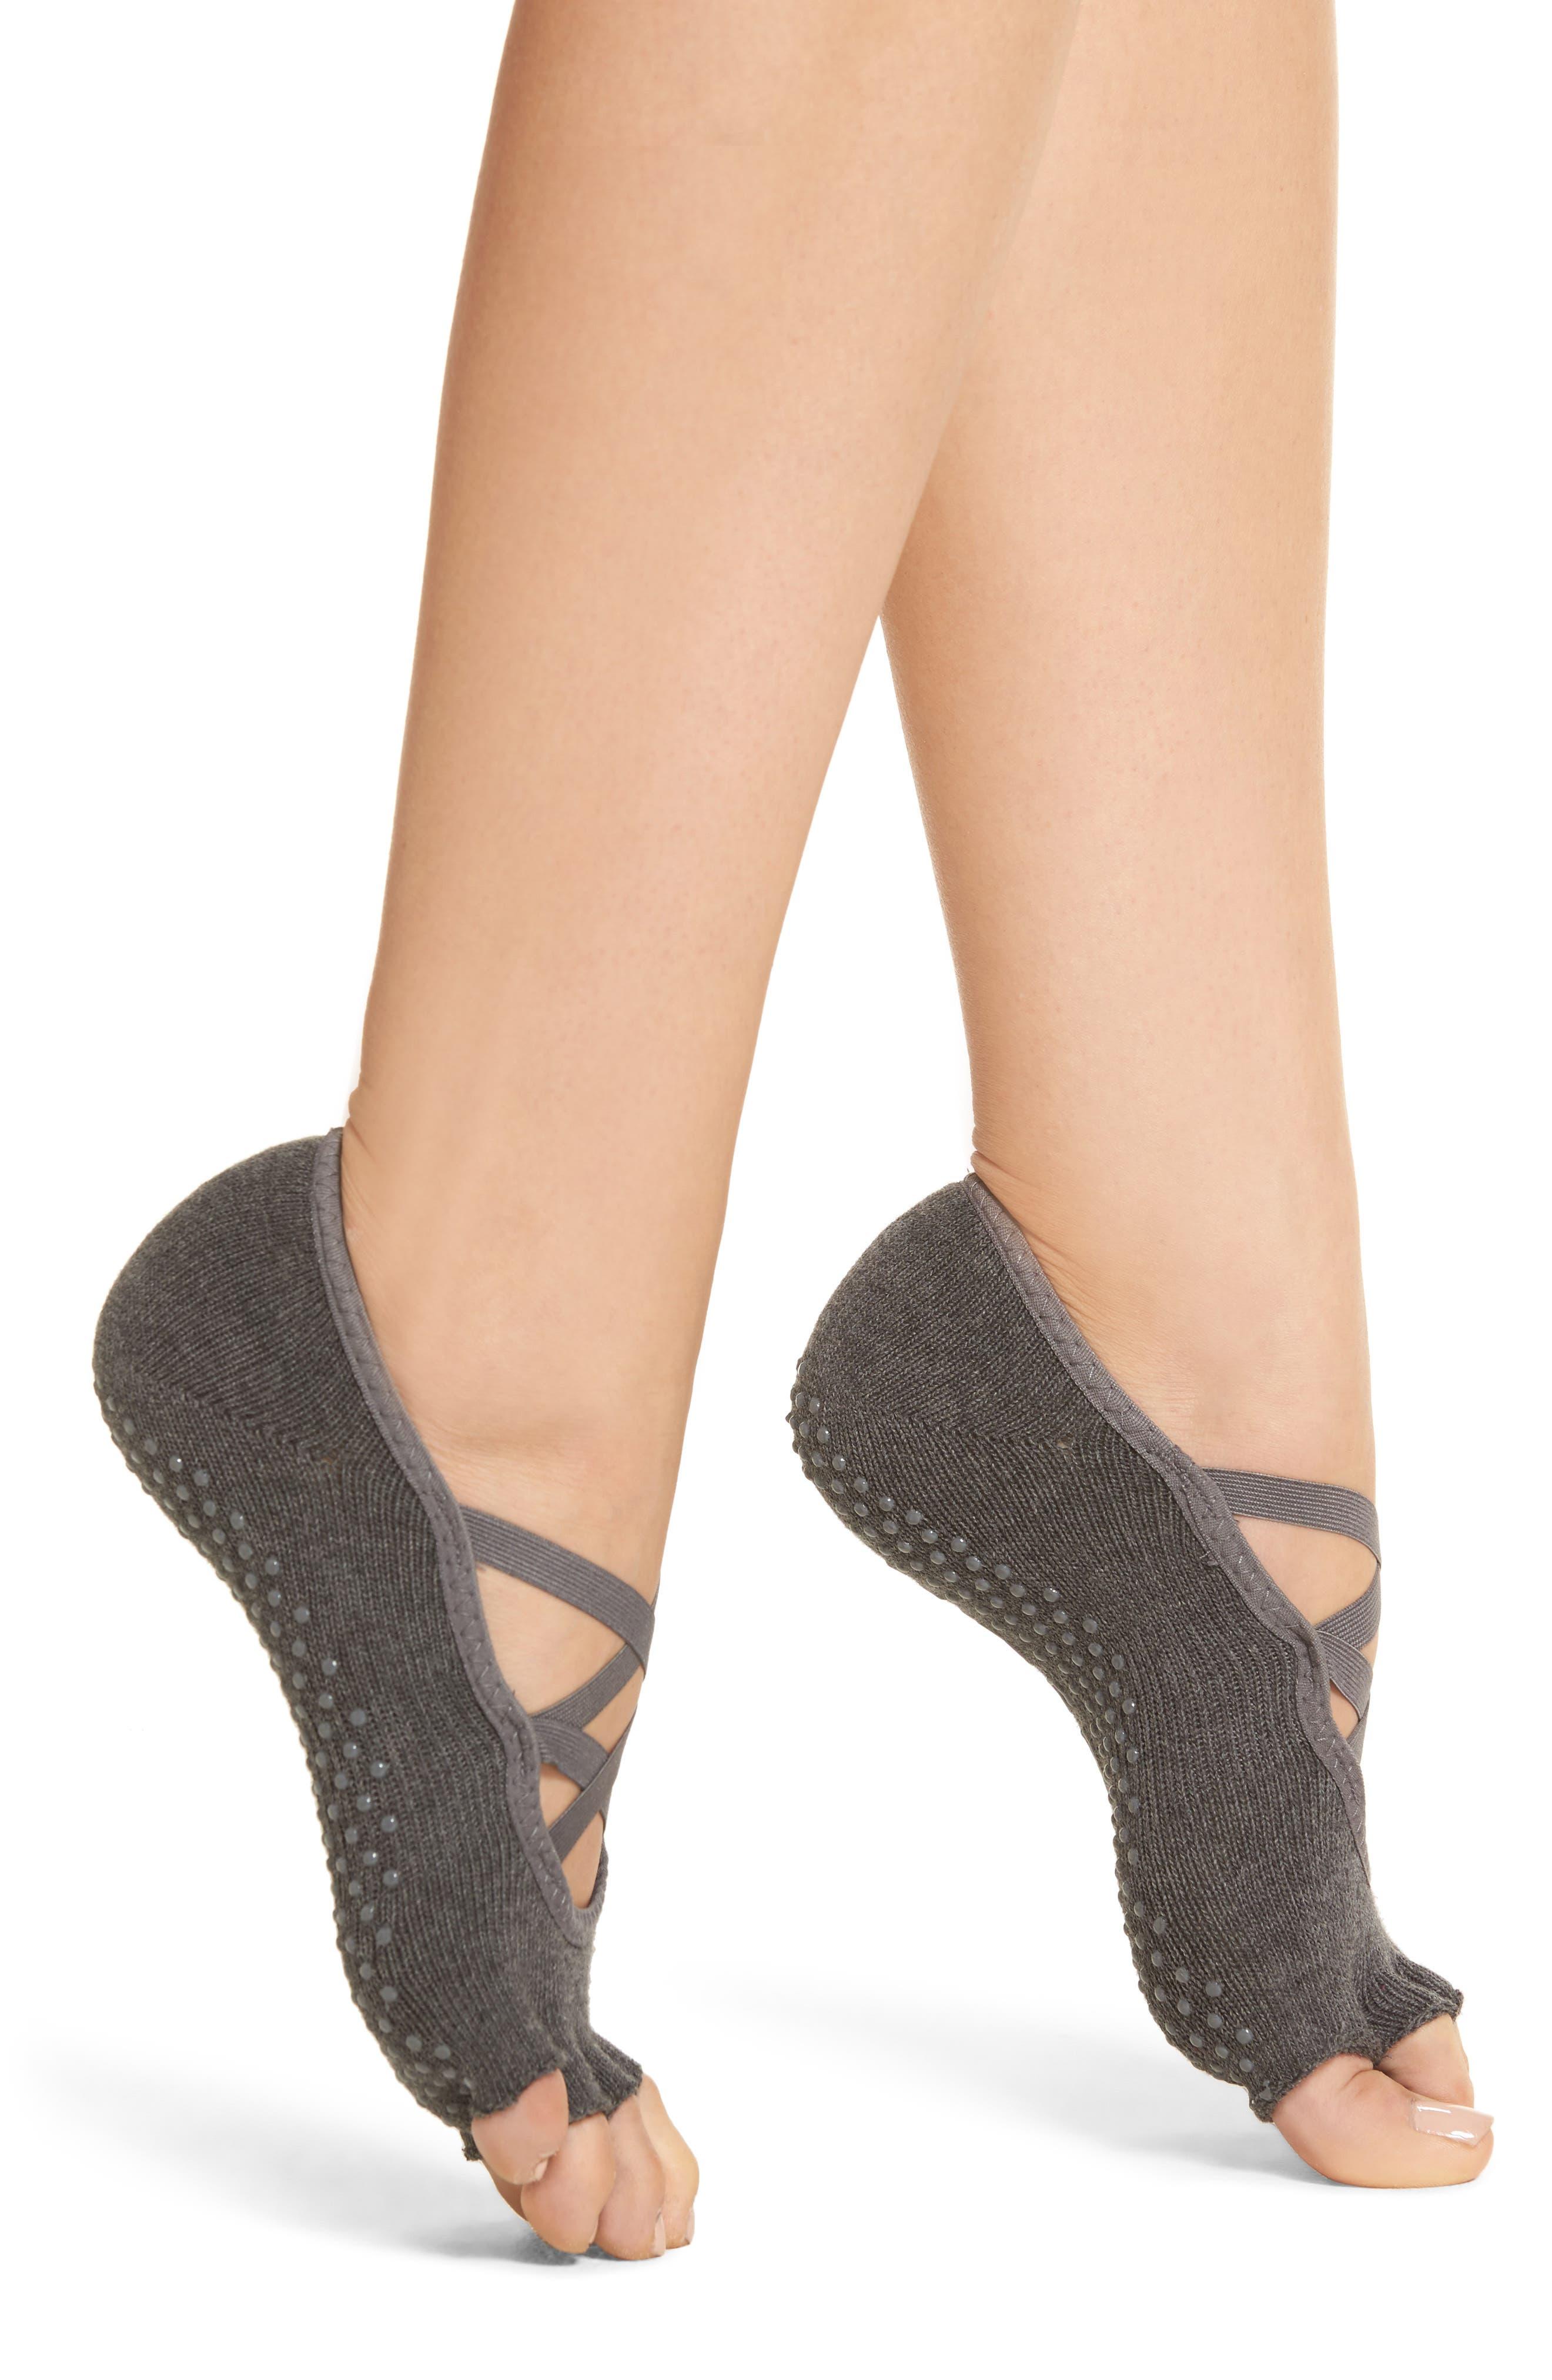 Elle Half Toe Gripper Socks,                             Main thumbnail 1, color,                             Charcoal